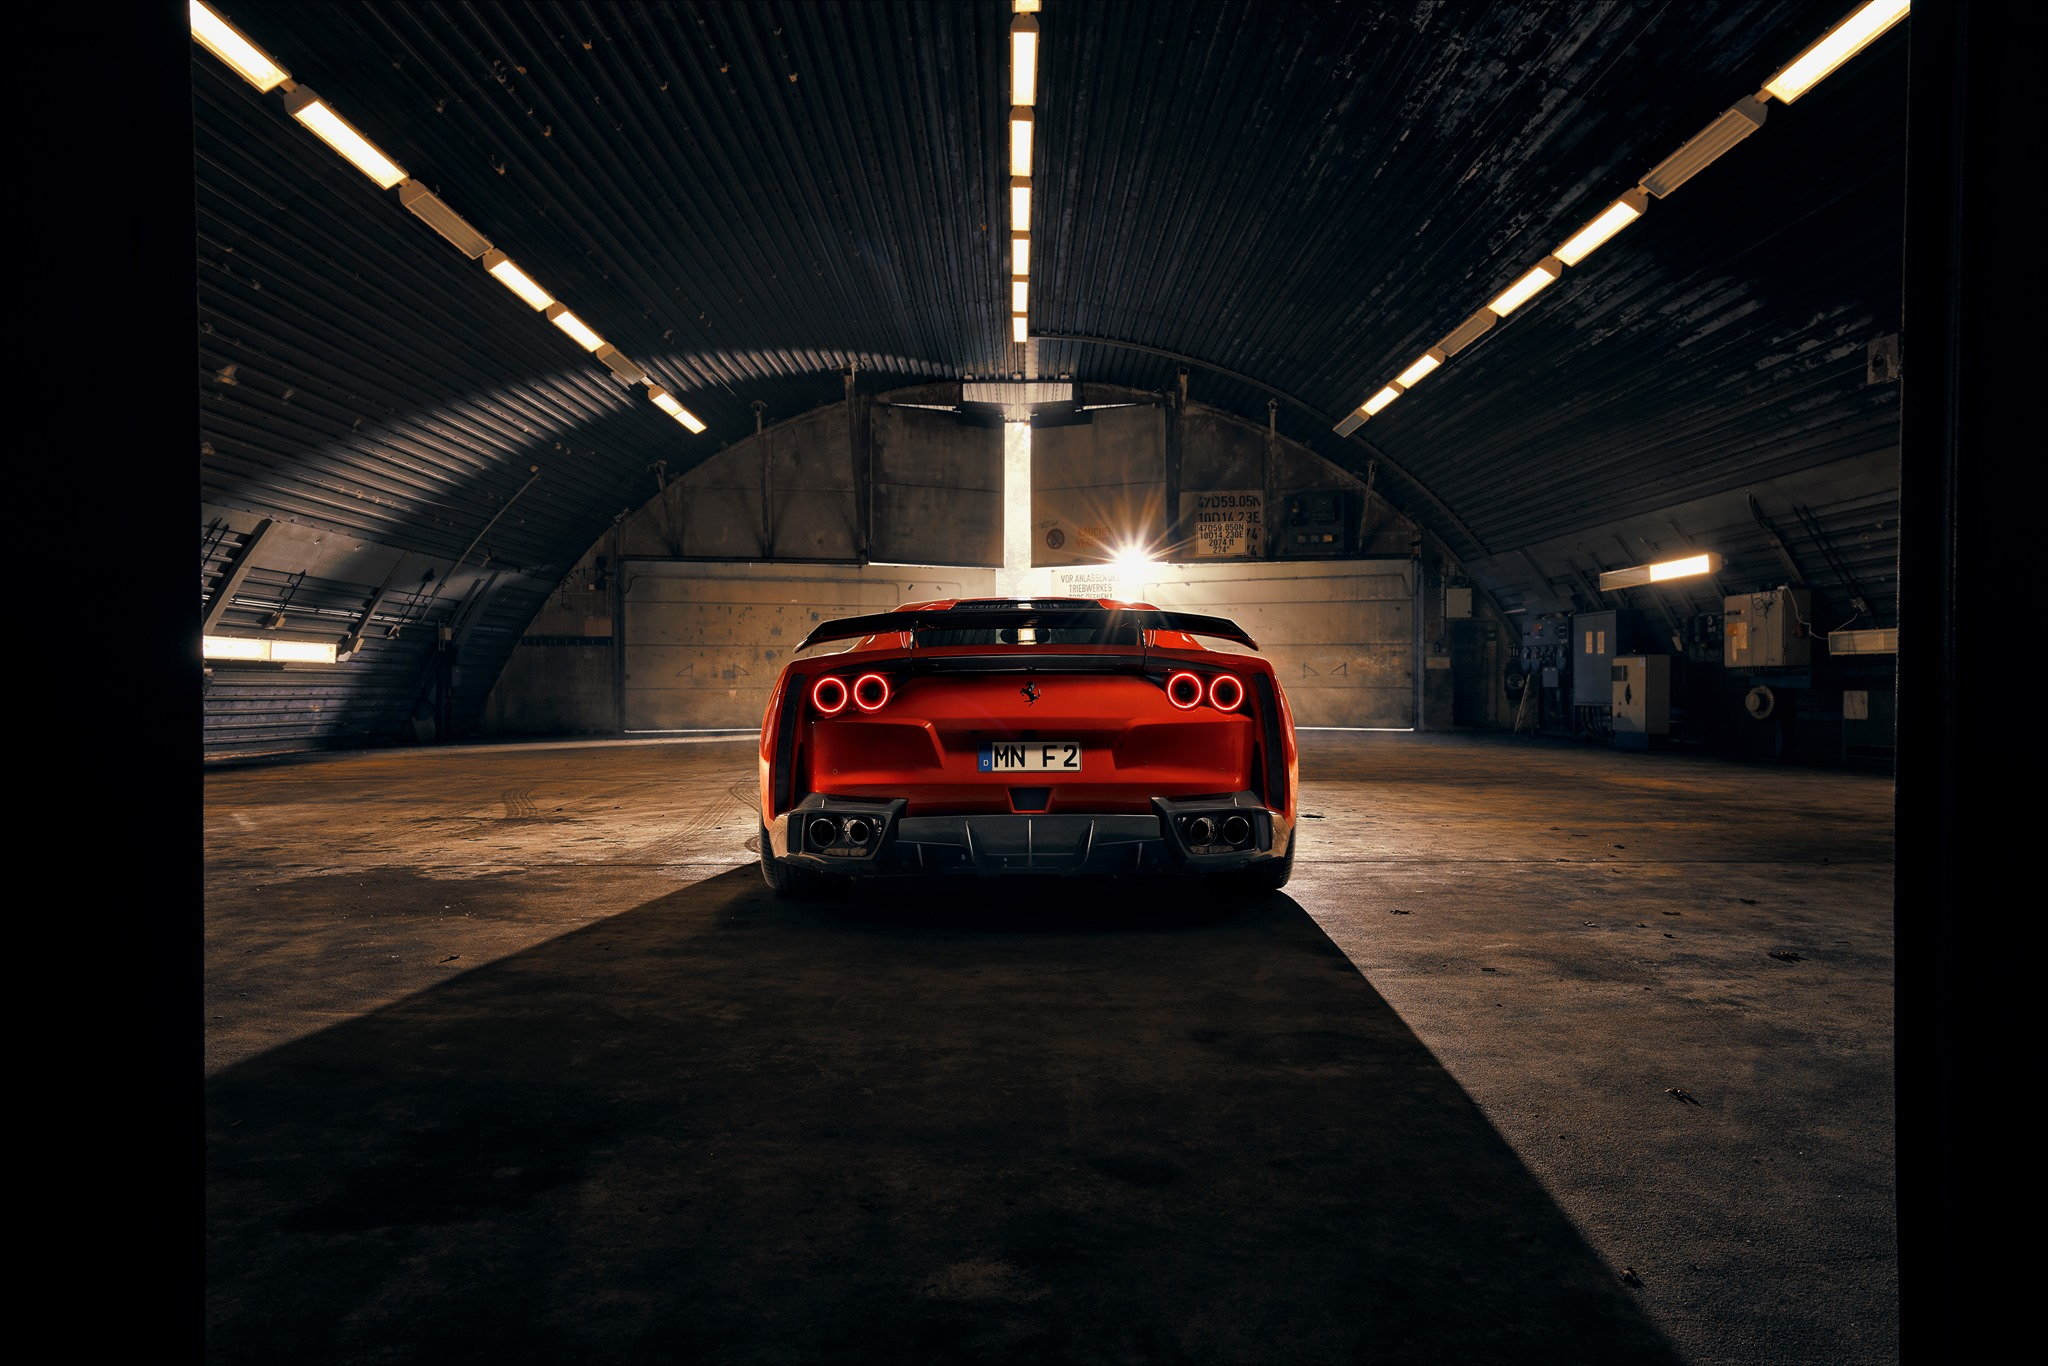 Ferrari-812-Superfast-N-Largo-by-Novitec-12